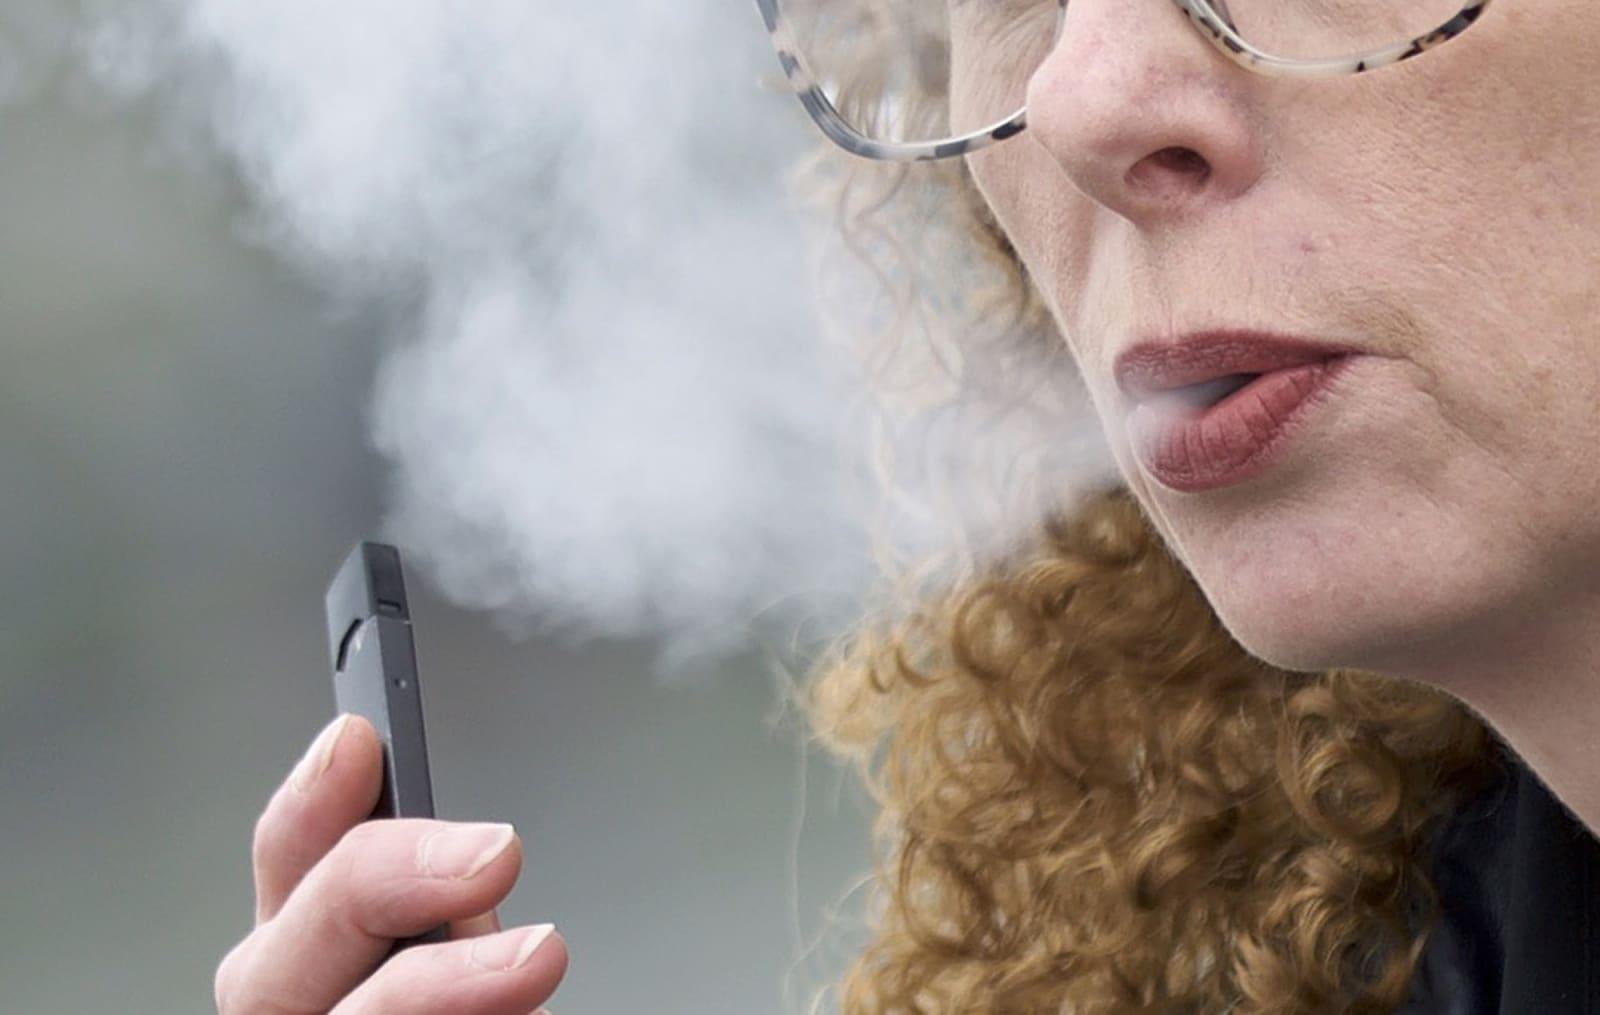 Walmart will reportedly stop selling e-cigarettes